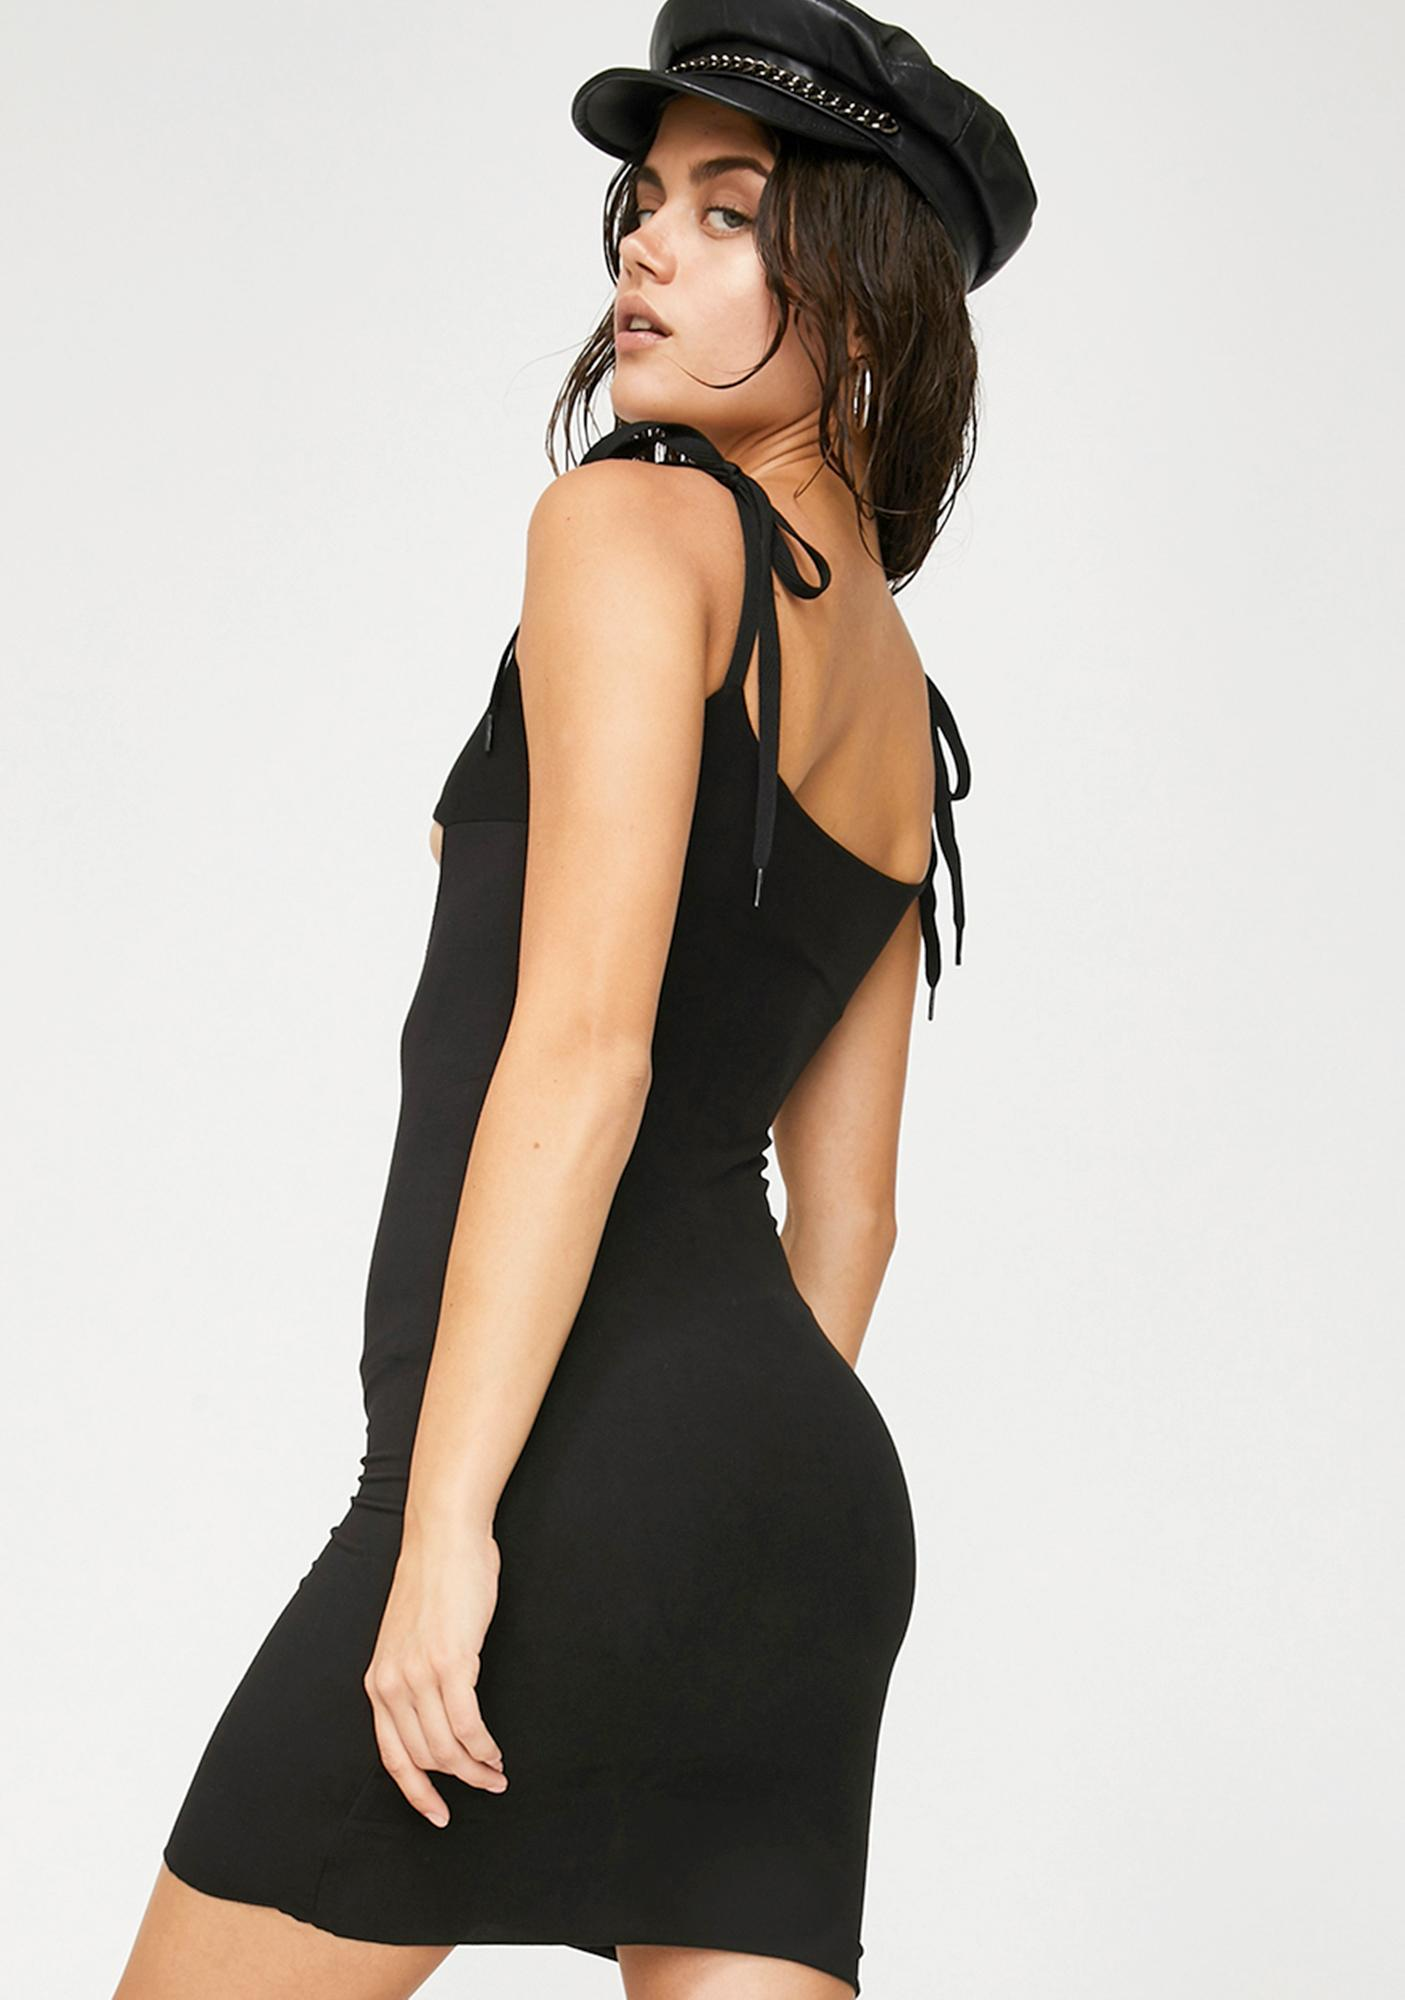 Riccetti Clothing Baddie Cut-Out Dress